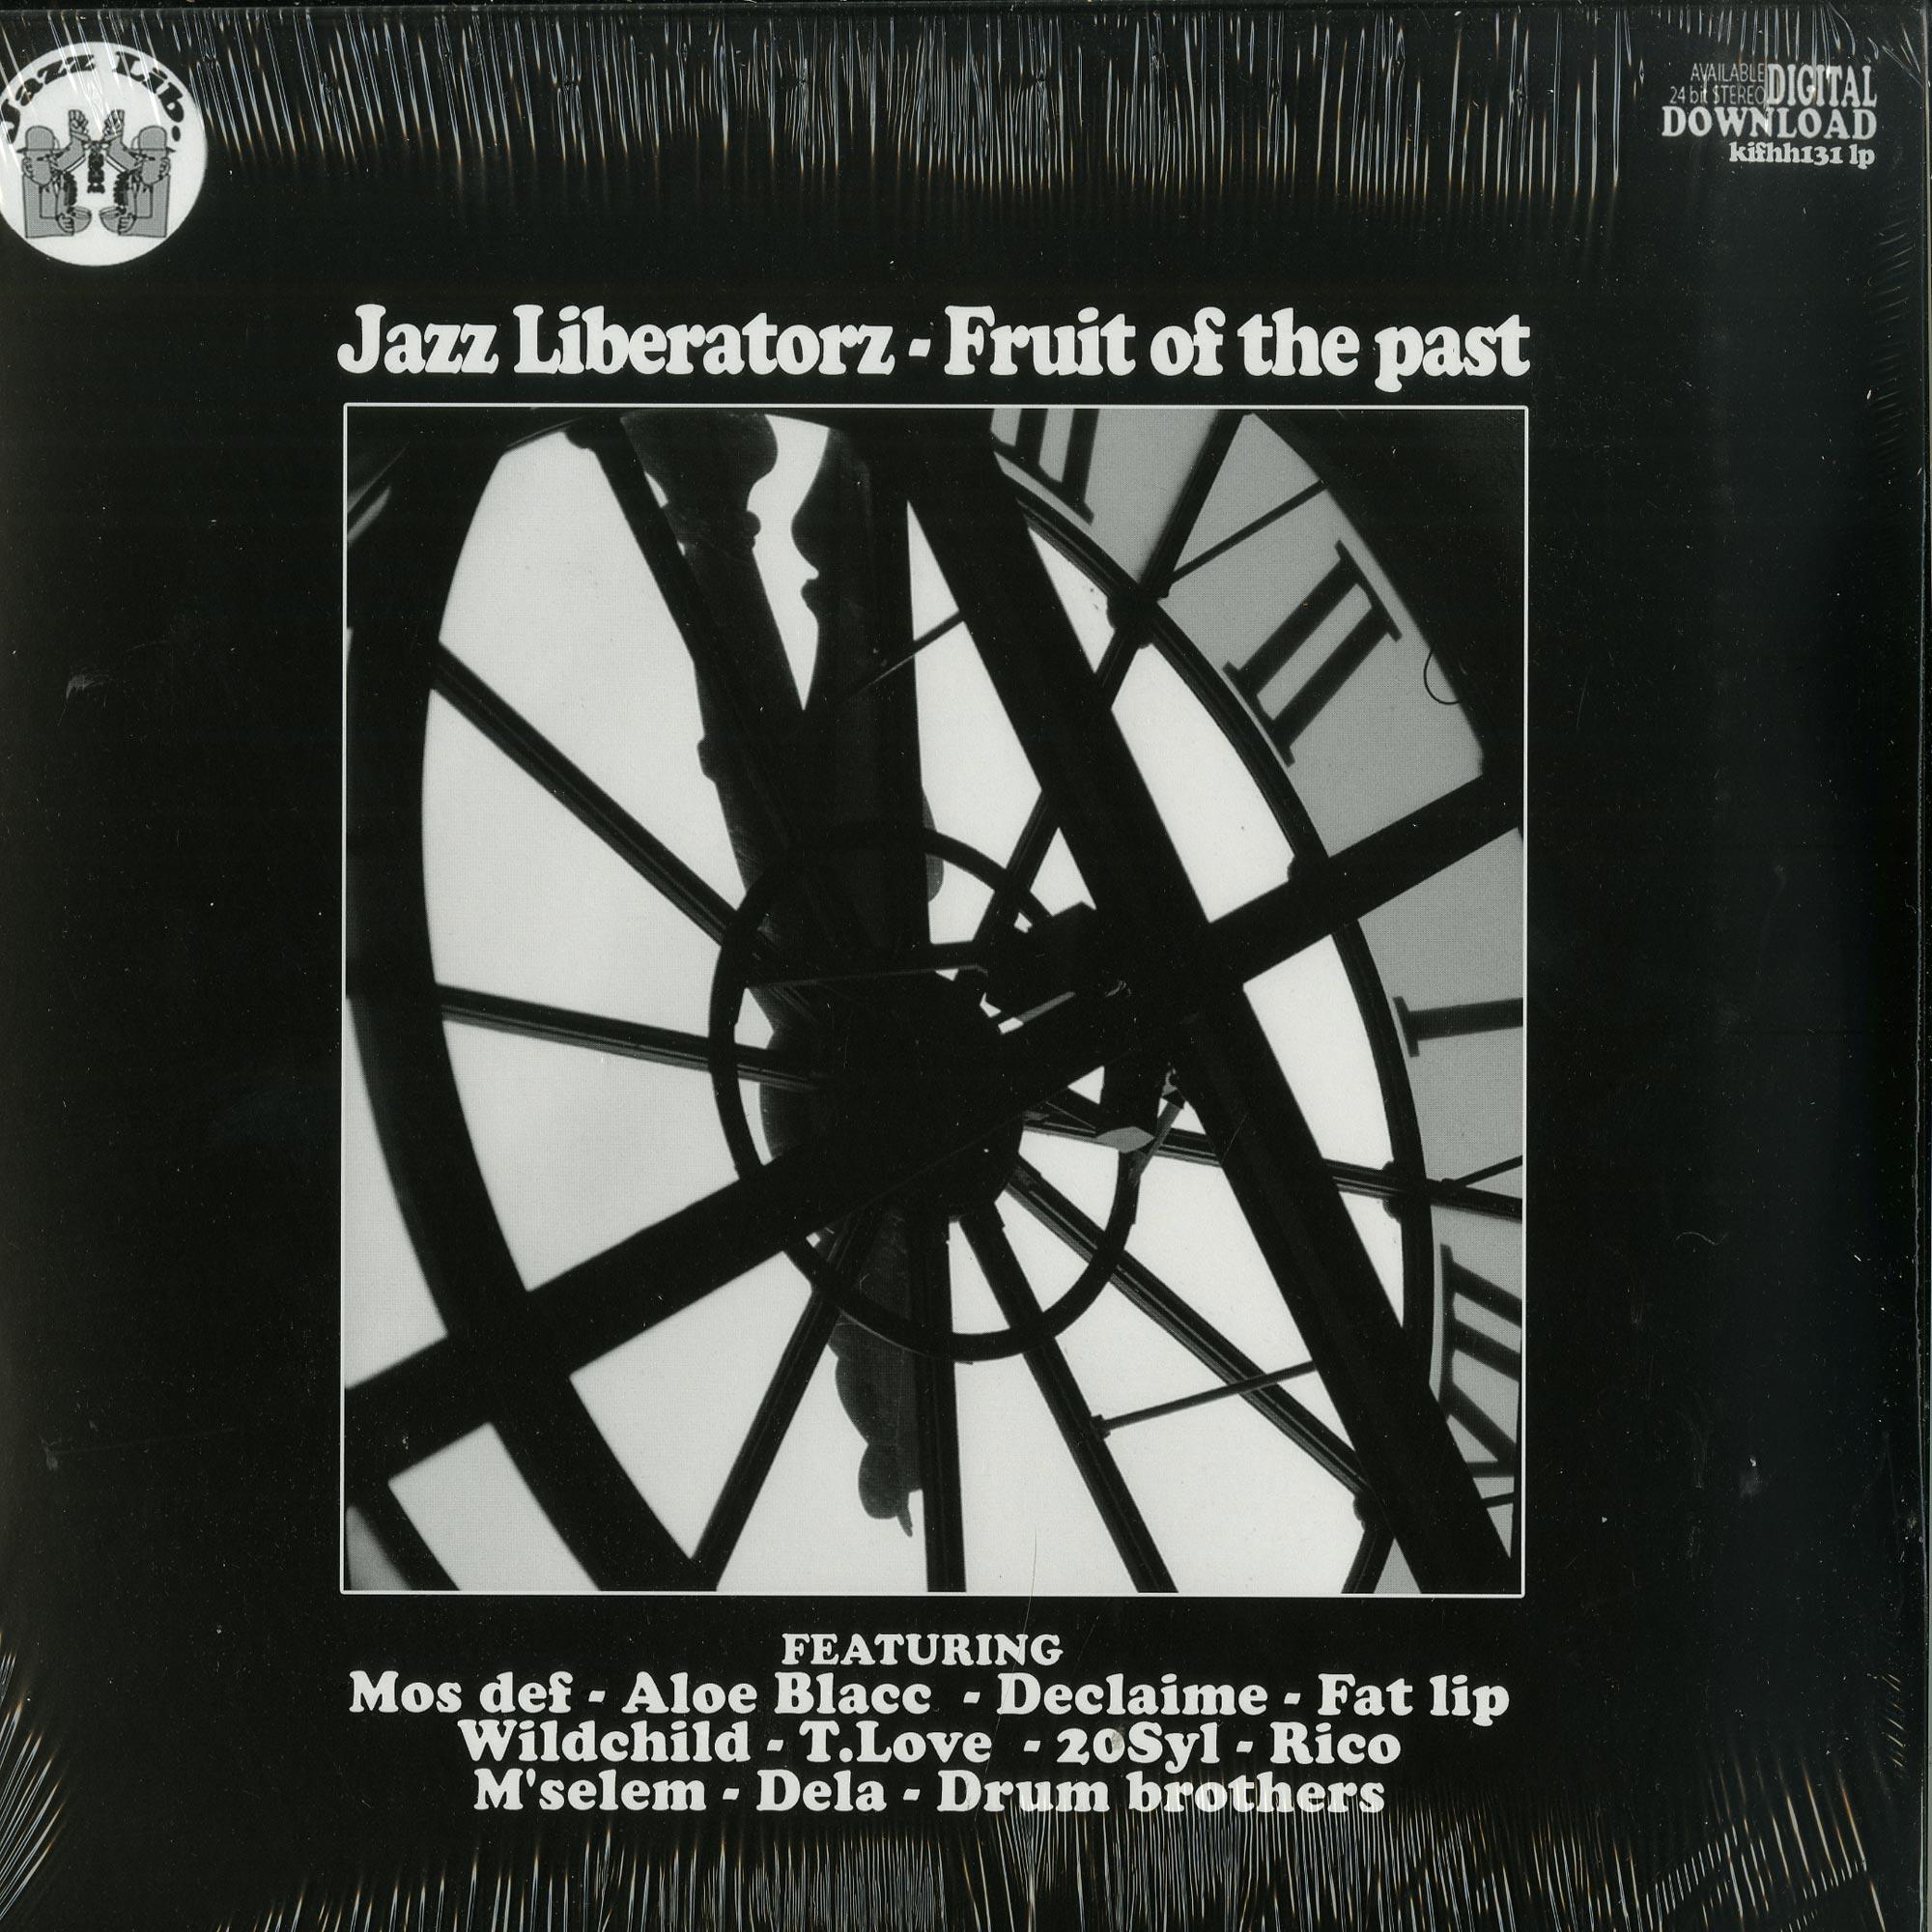 Jazz Liberatorz - FRUIT OF THE PAST